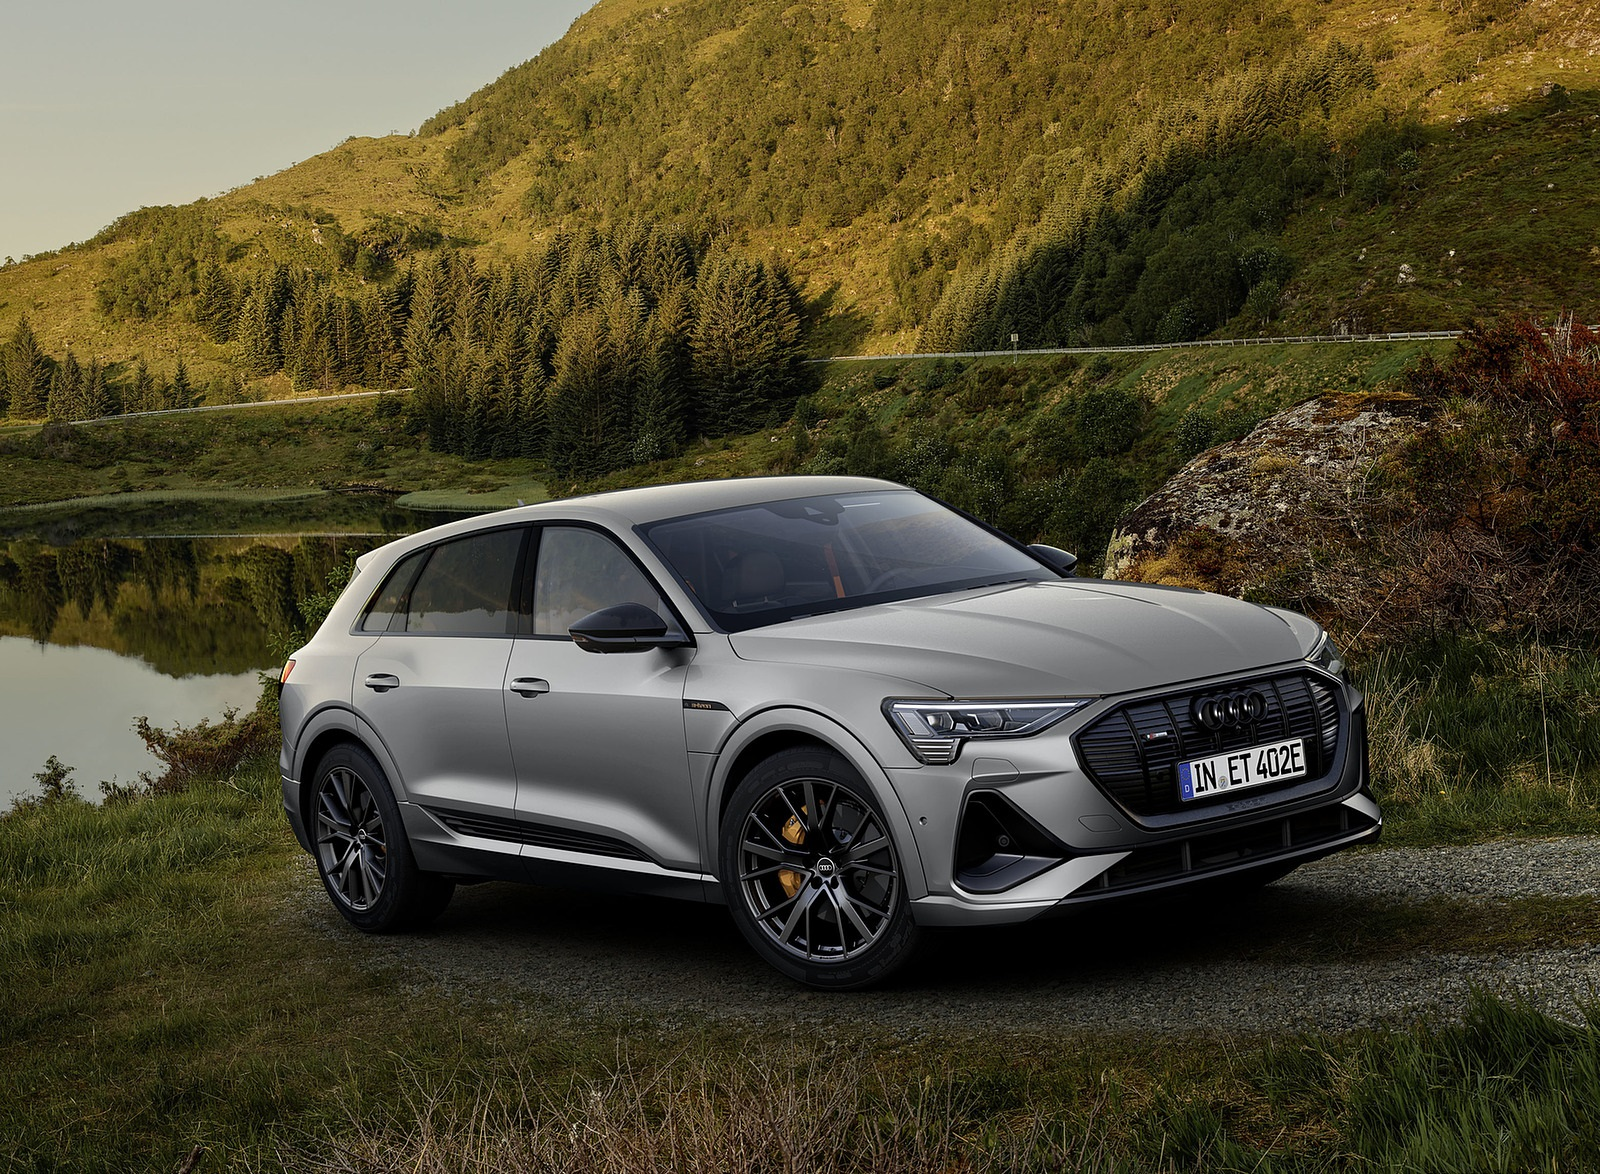 2022 Audi e-tron S Line Black Edition (Color: Chronos Grey Metallic) Front Three-Quarter Wallpapers (1)